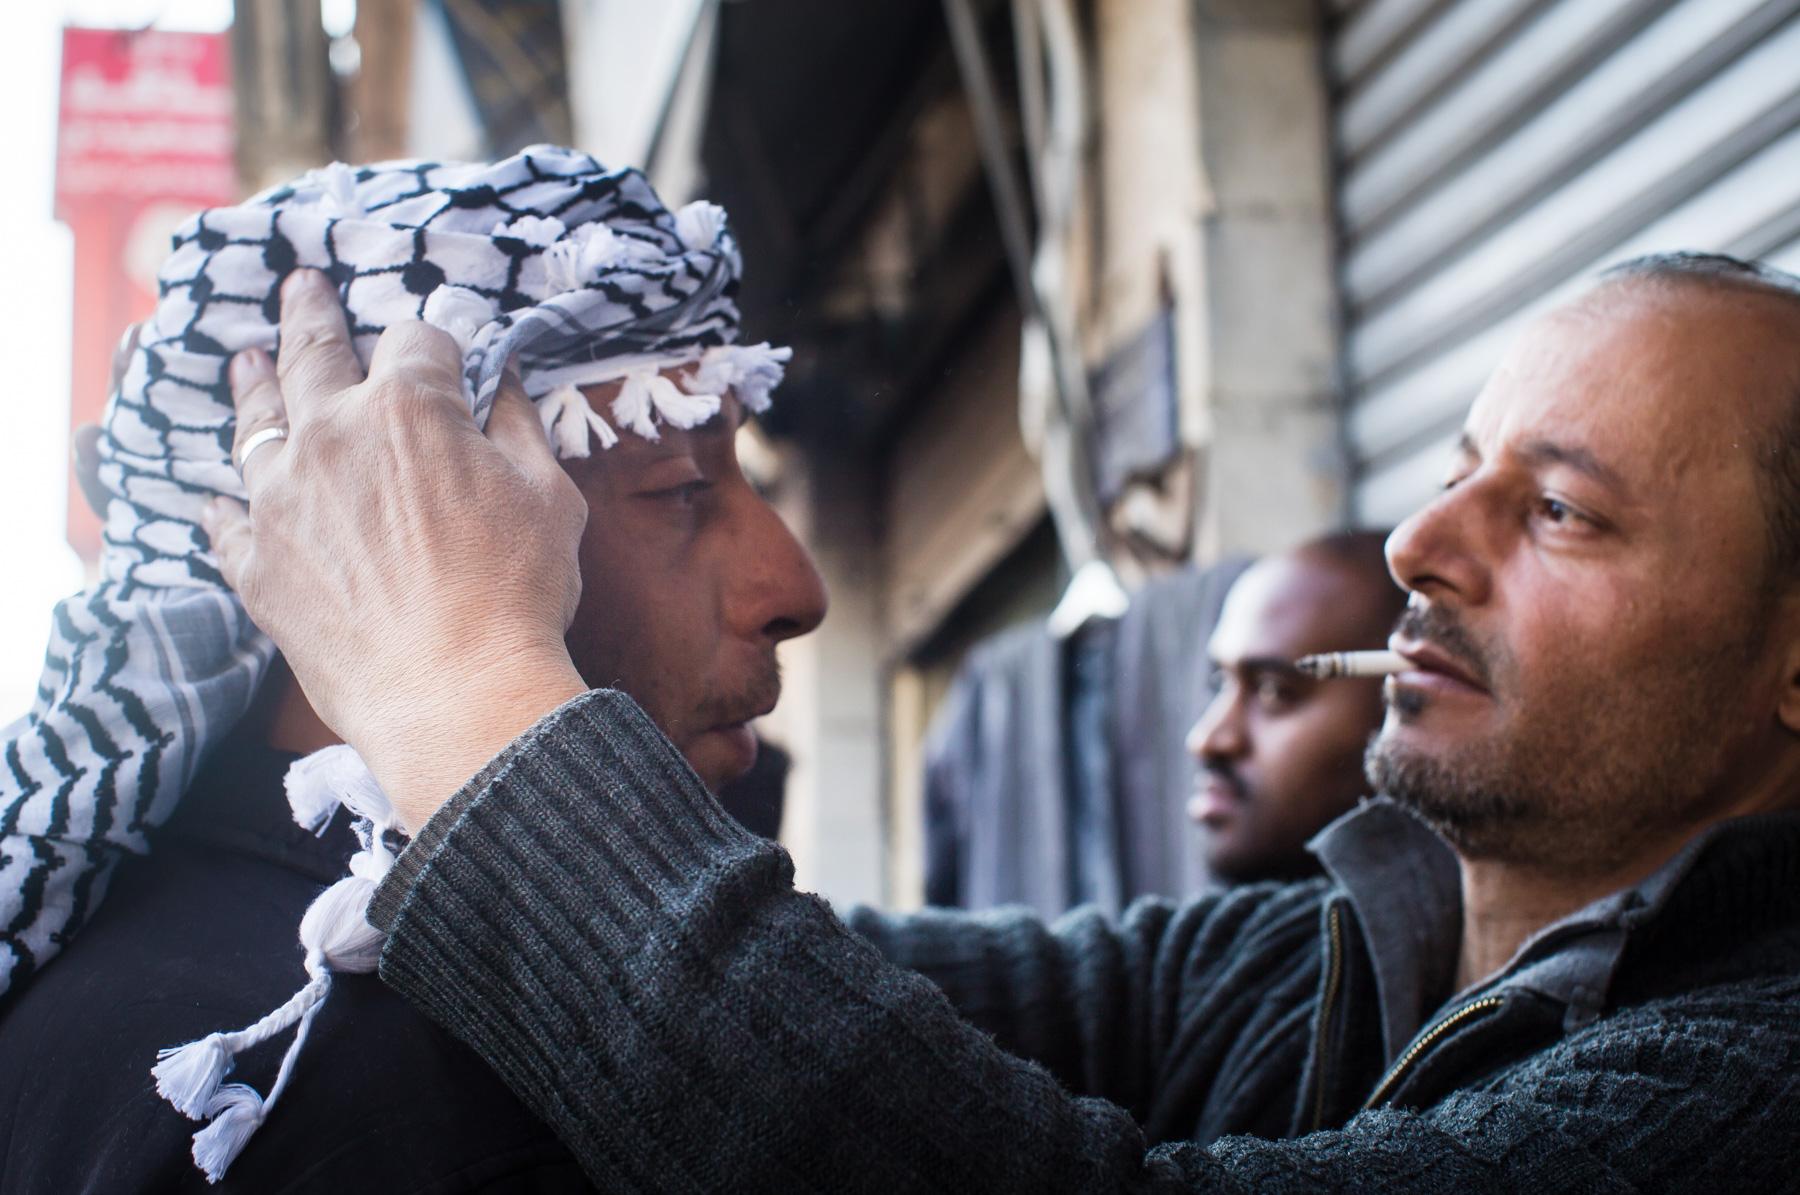 A shopkeeper helps a man adjust his Palestinian keffiyah scarf during a demonstration in downtown Amman, Jordan, on Dec. 8, 2017.